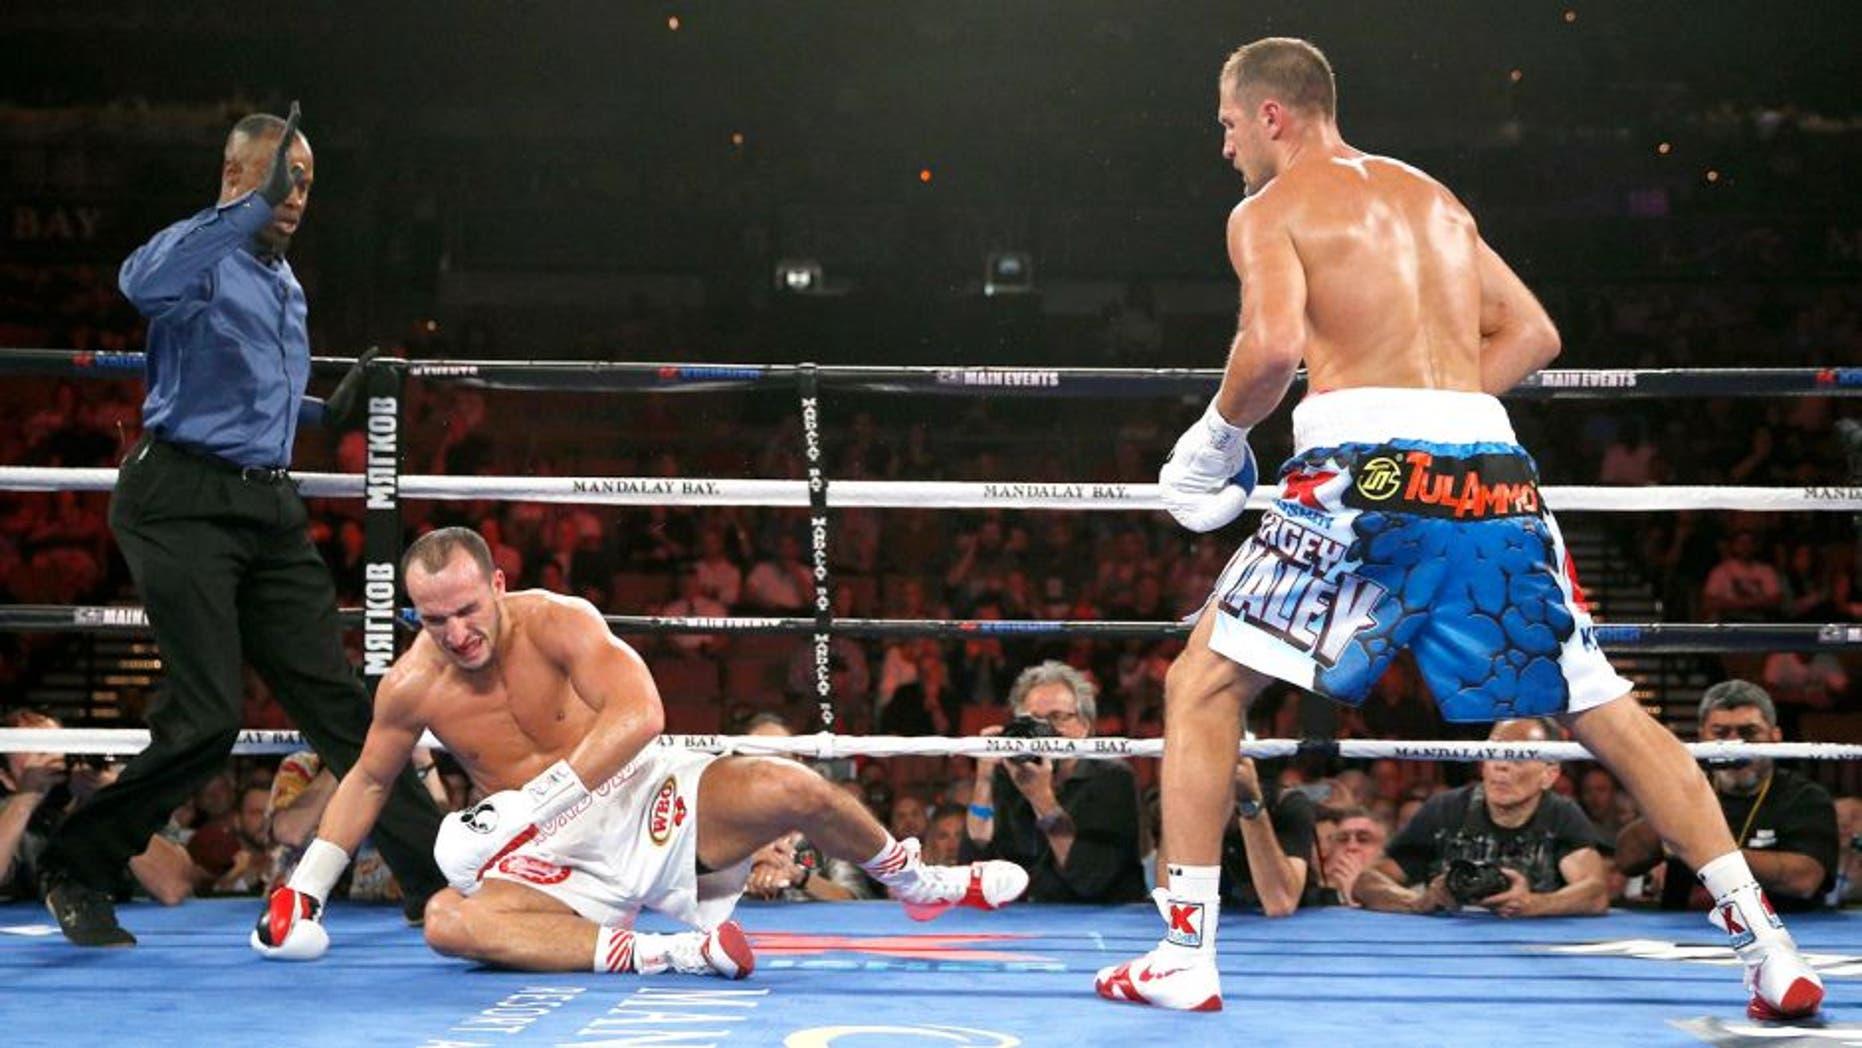 Sergey Kovalev knocks down Nadjib Mohammedi to win their light heavyweight title boxing bout Saturday, July 25, 2015, in Las Vegas. (AP Photo/John Locher)